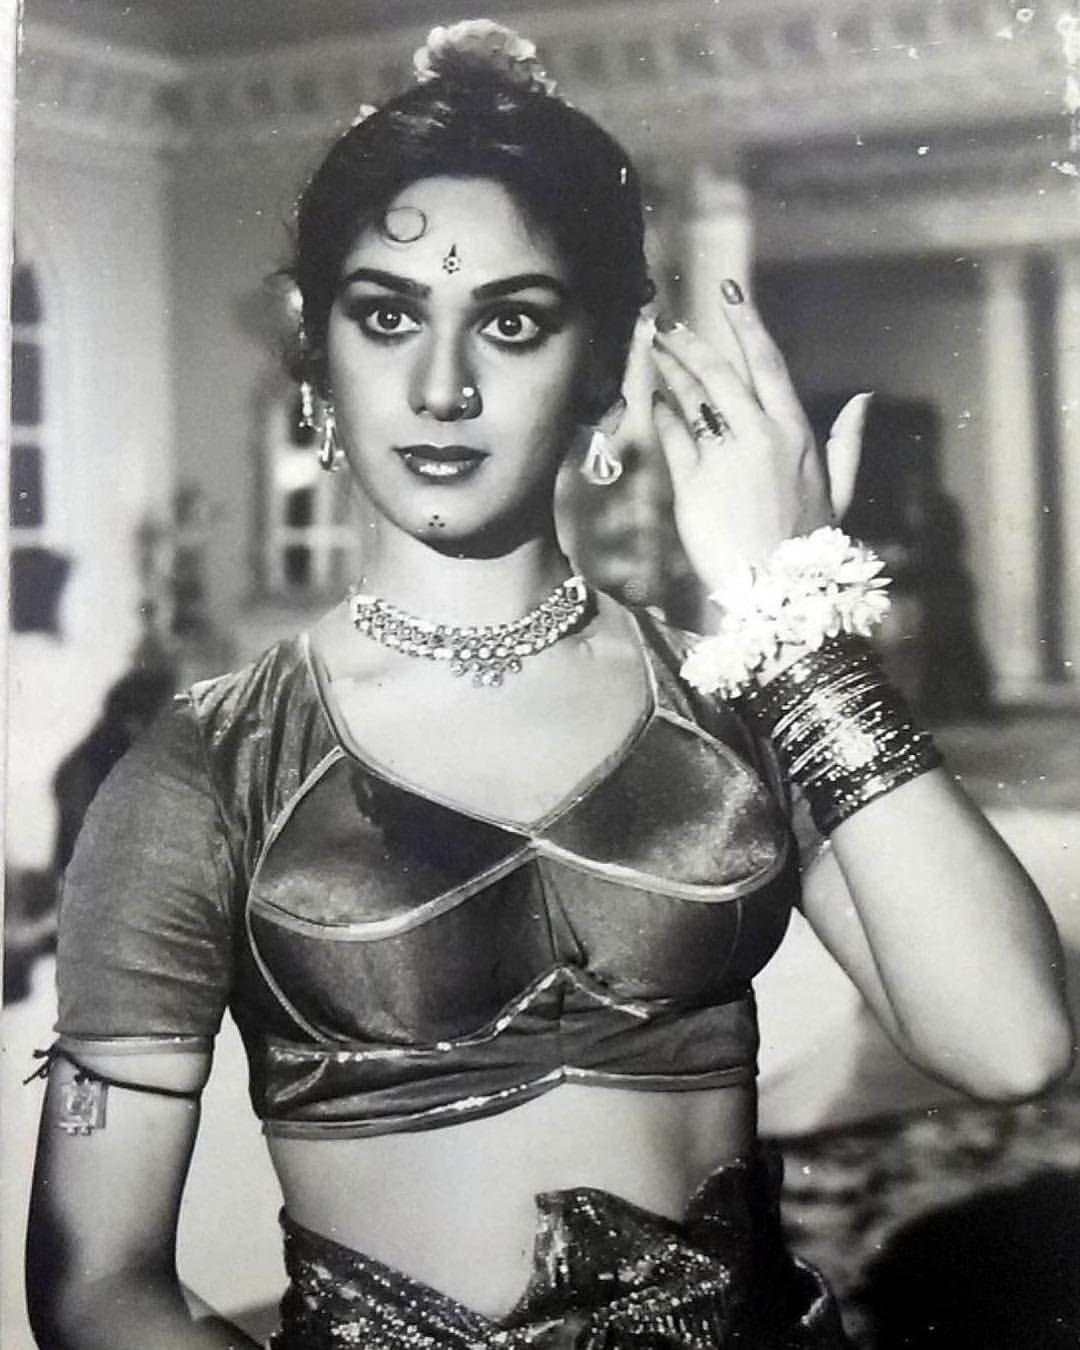 #meenakshiseshadri #BollywoodFlashback #80s #muvyz082518